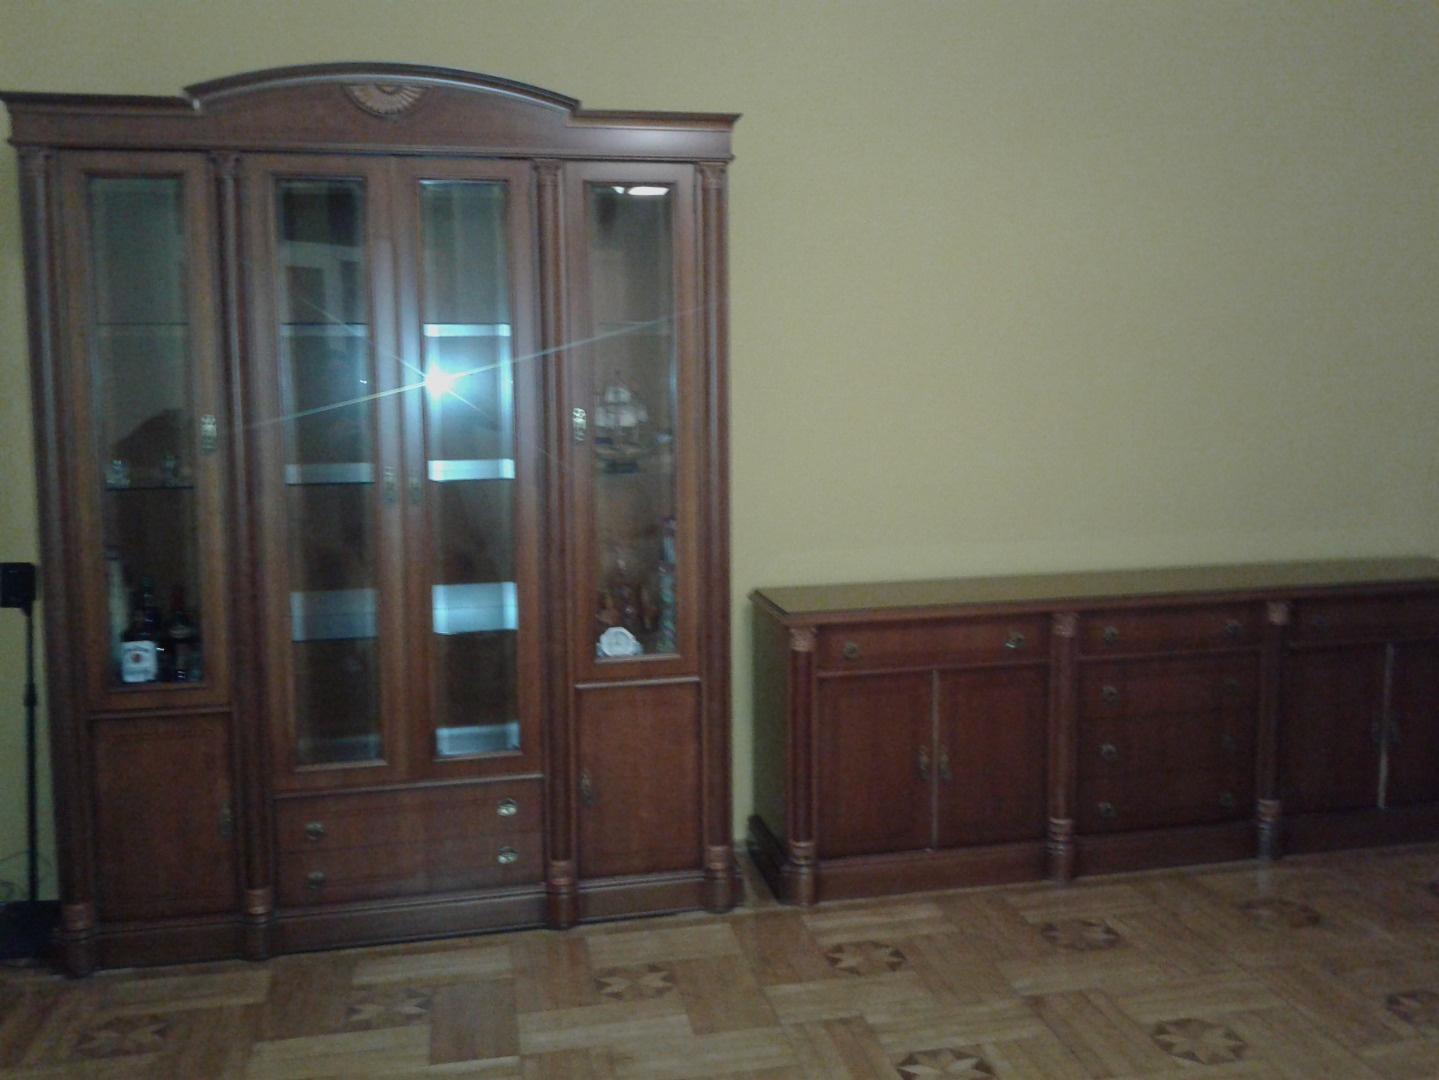 Продается 2-комнатная Квартира на ул. Шевченко Пр. — 90 000 у.е. (фото №13)